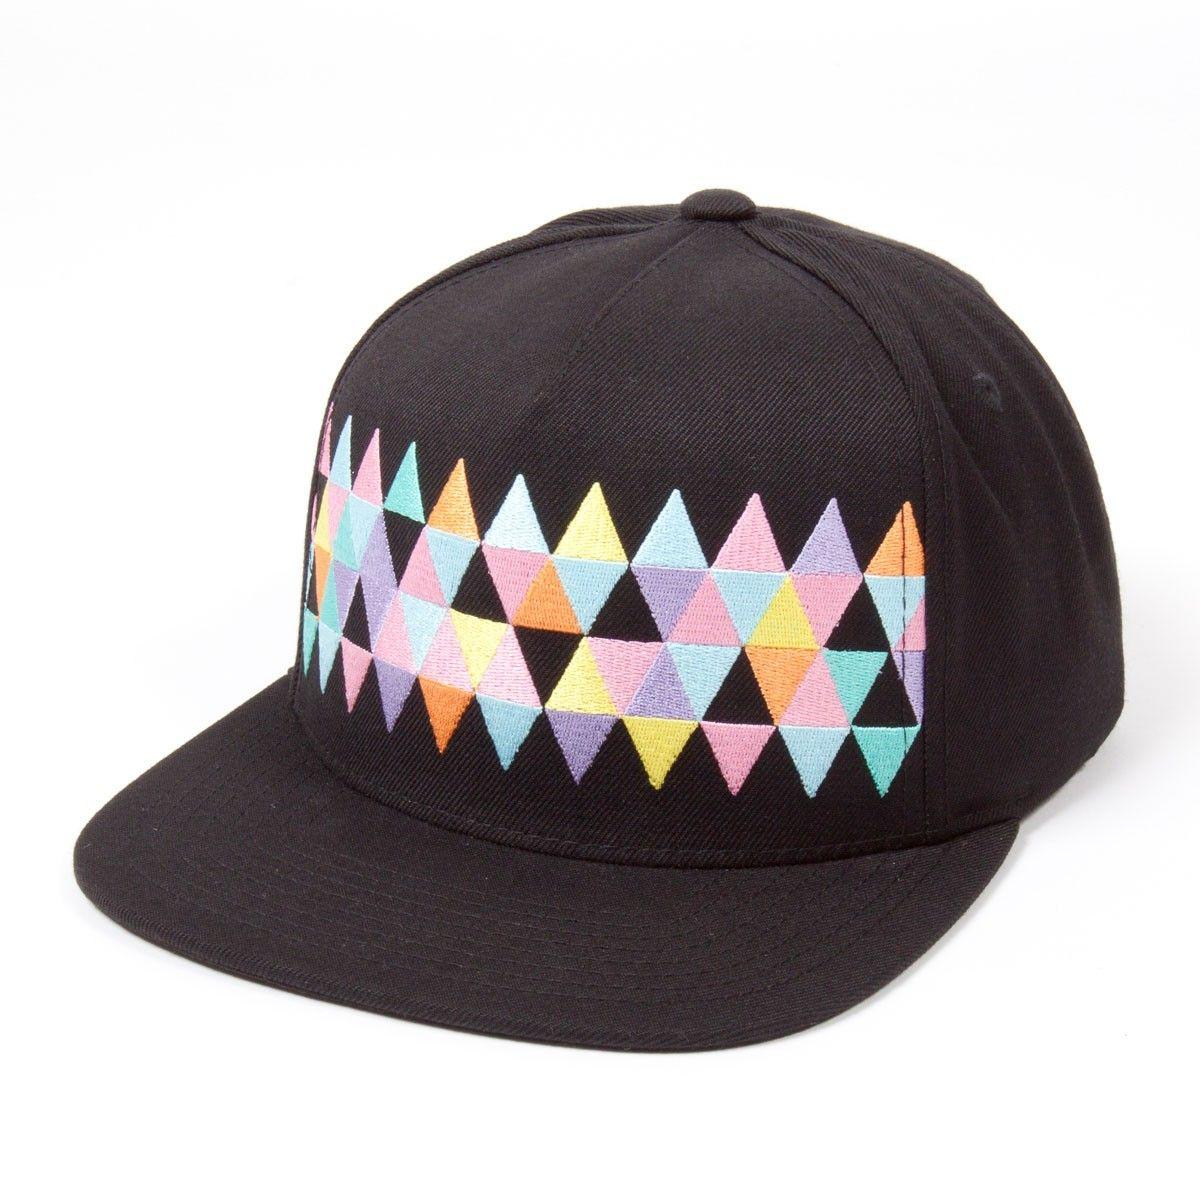 Woven Rainbow Pinch Panel Snapback Cap Black  1899619c882